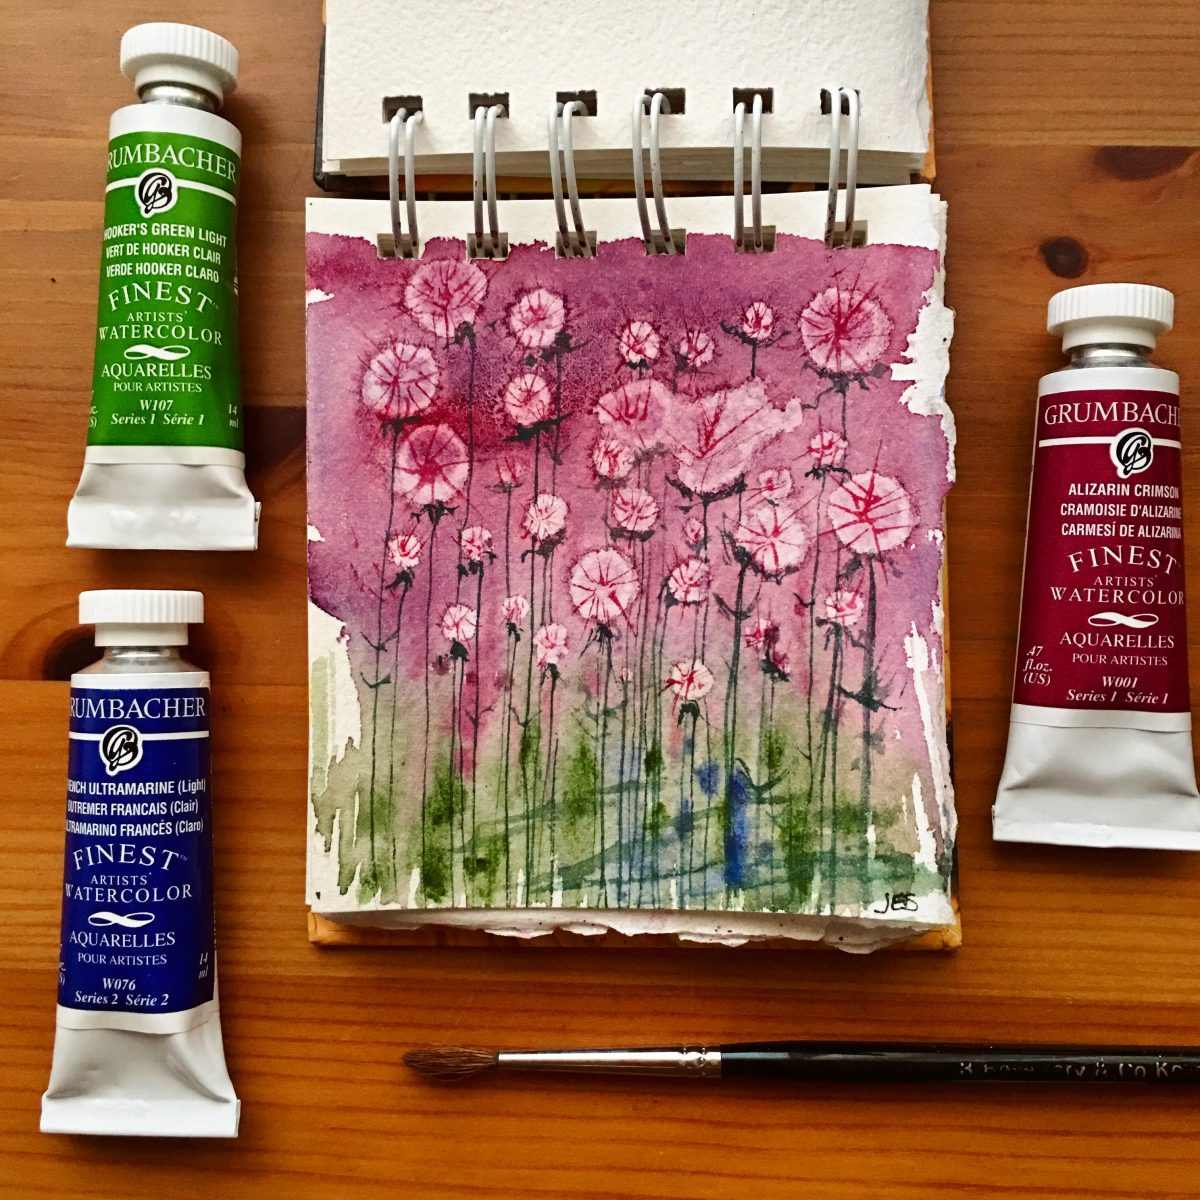 doodlewash review grumbacher finest artists watercolor doodlewash